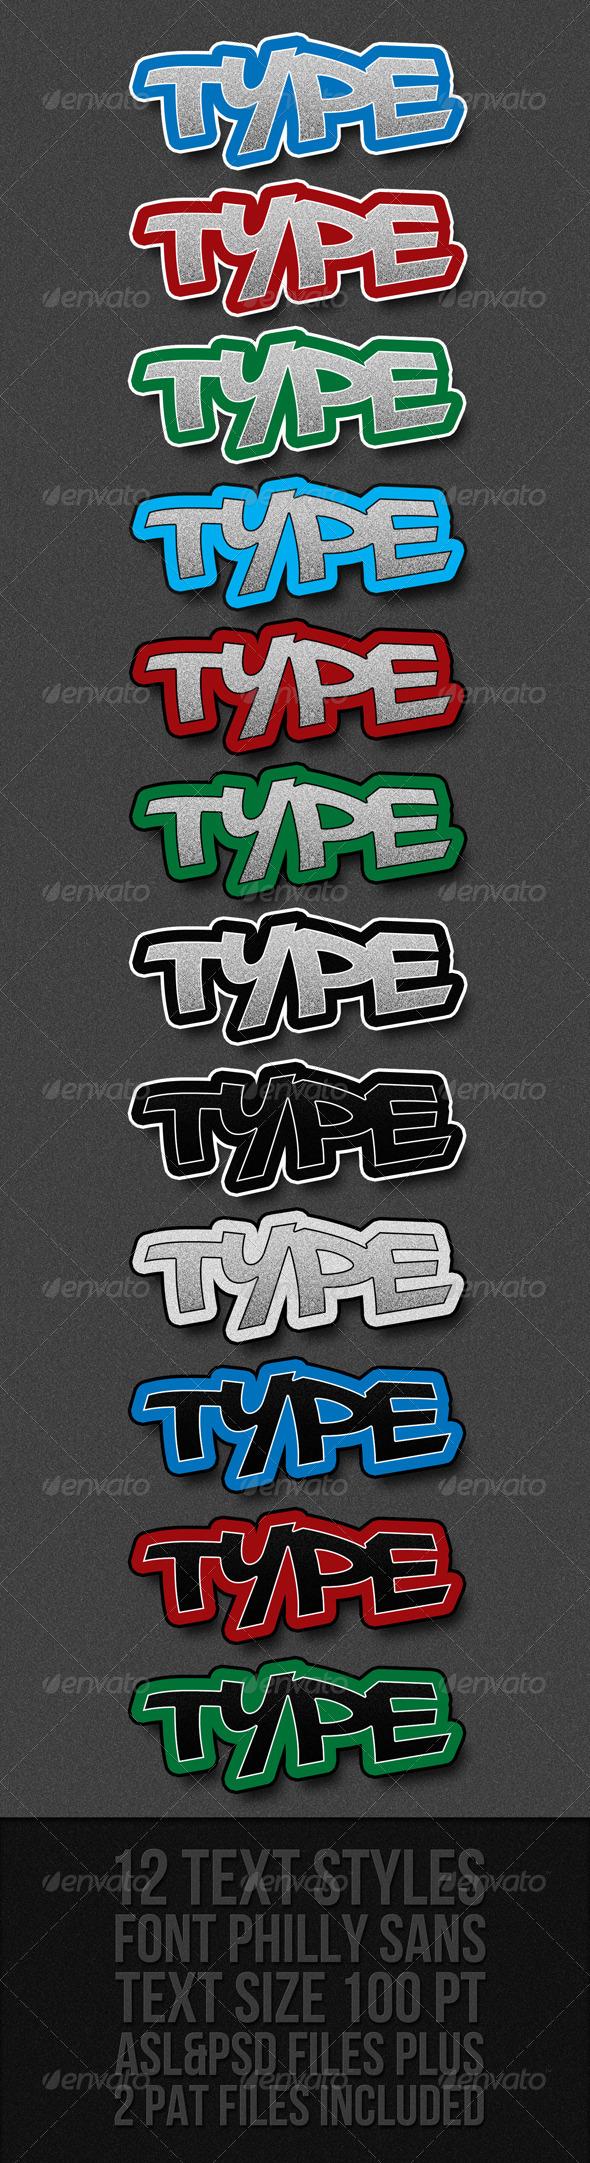 GraphicRiver Graffiti Text Styles 301630